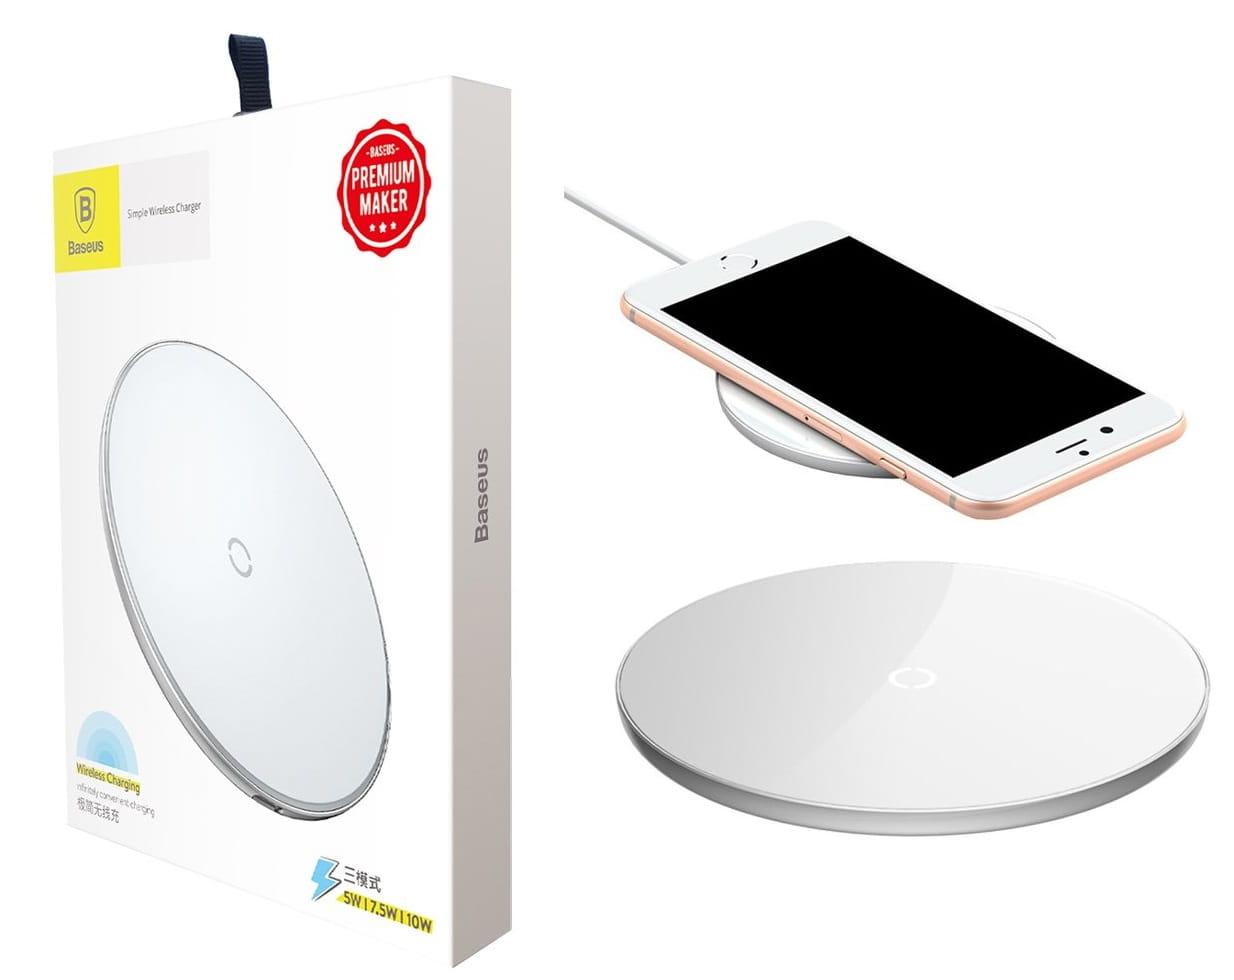 Baseus ładowarka indukcyjna Qi Fast iPhone 8 X XS XR XS MAX biała